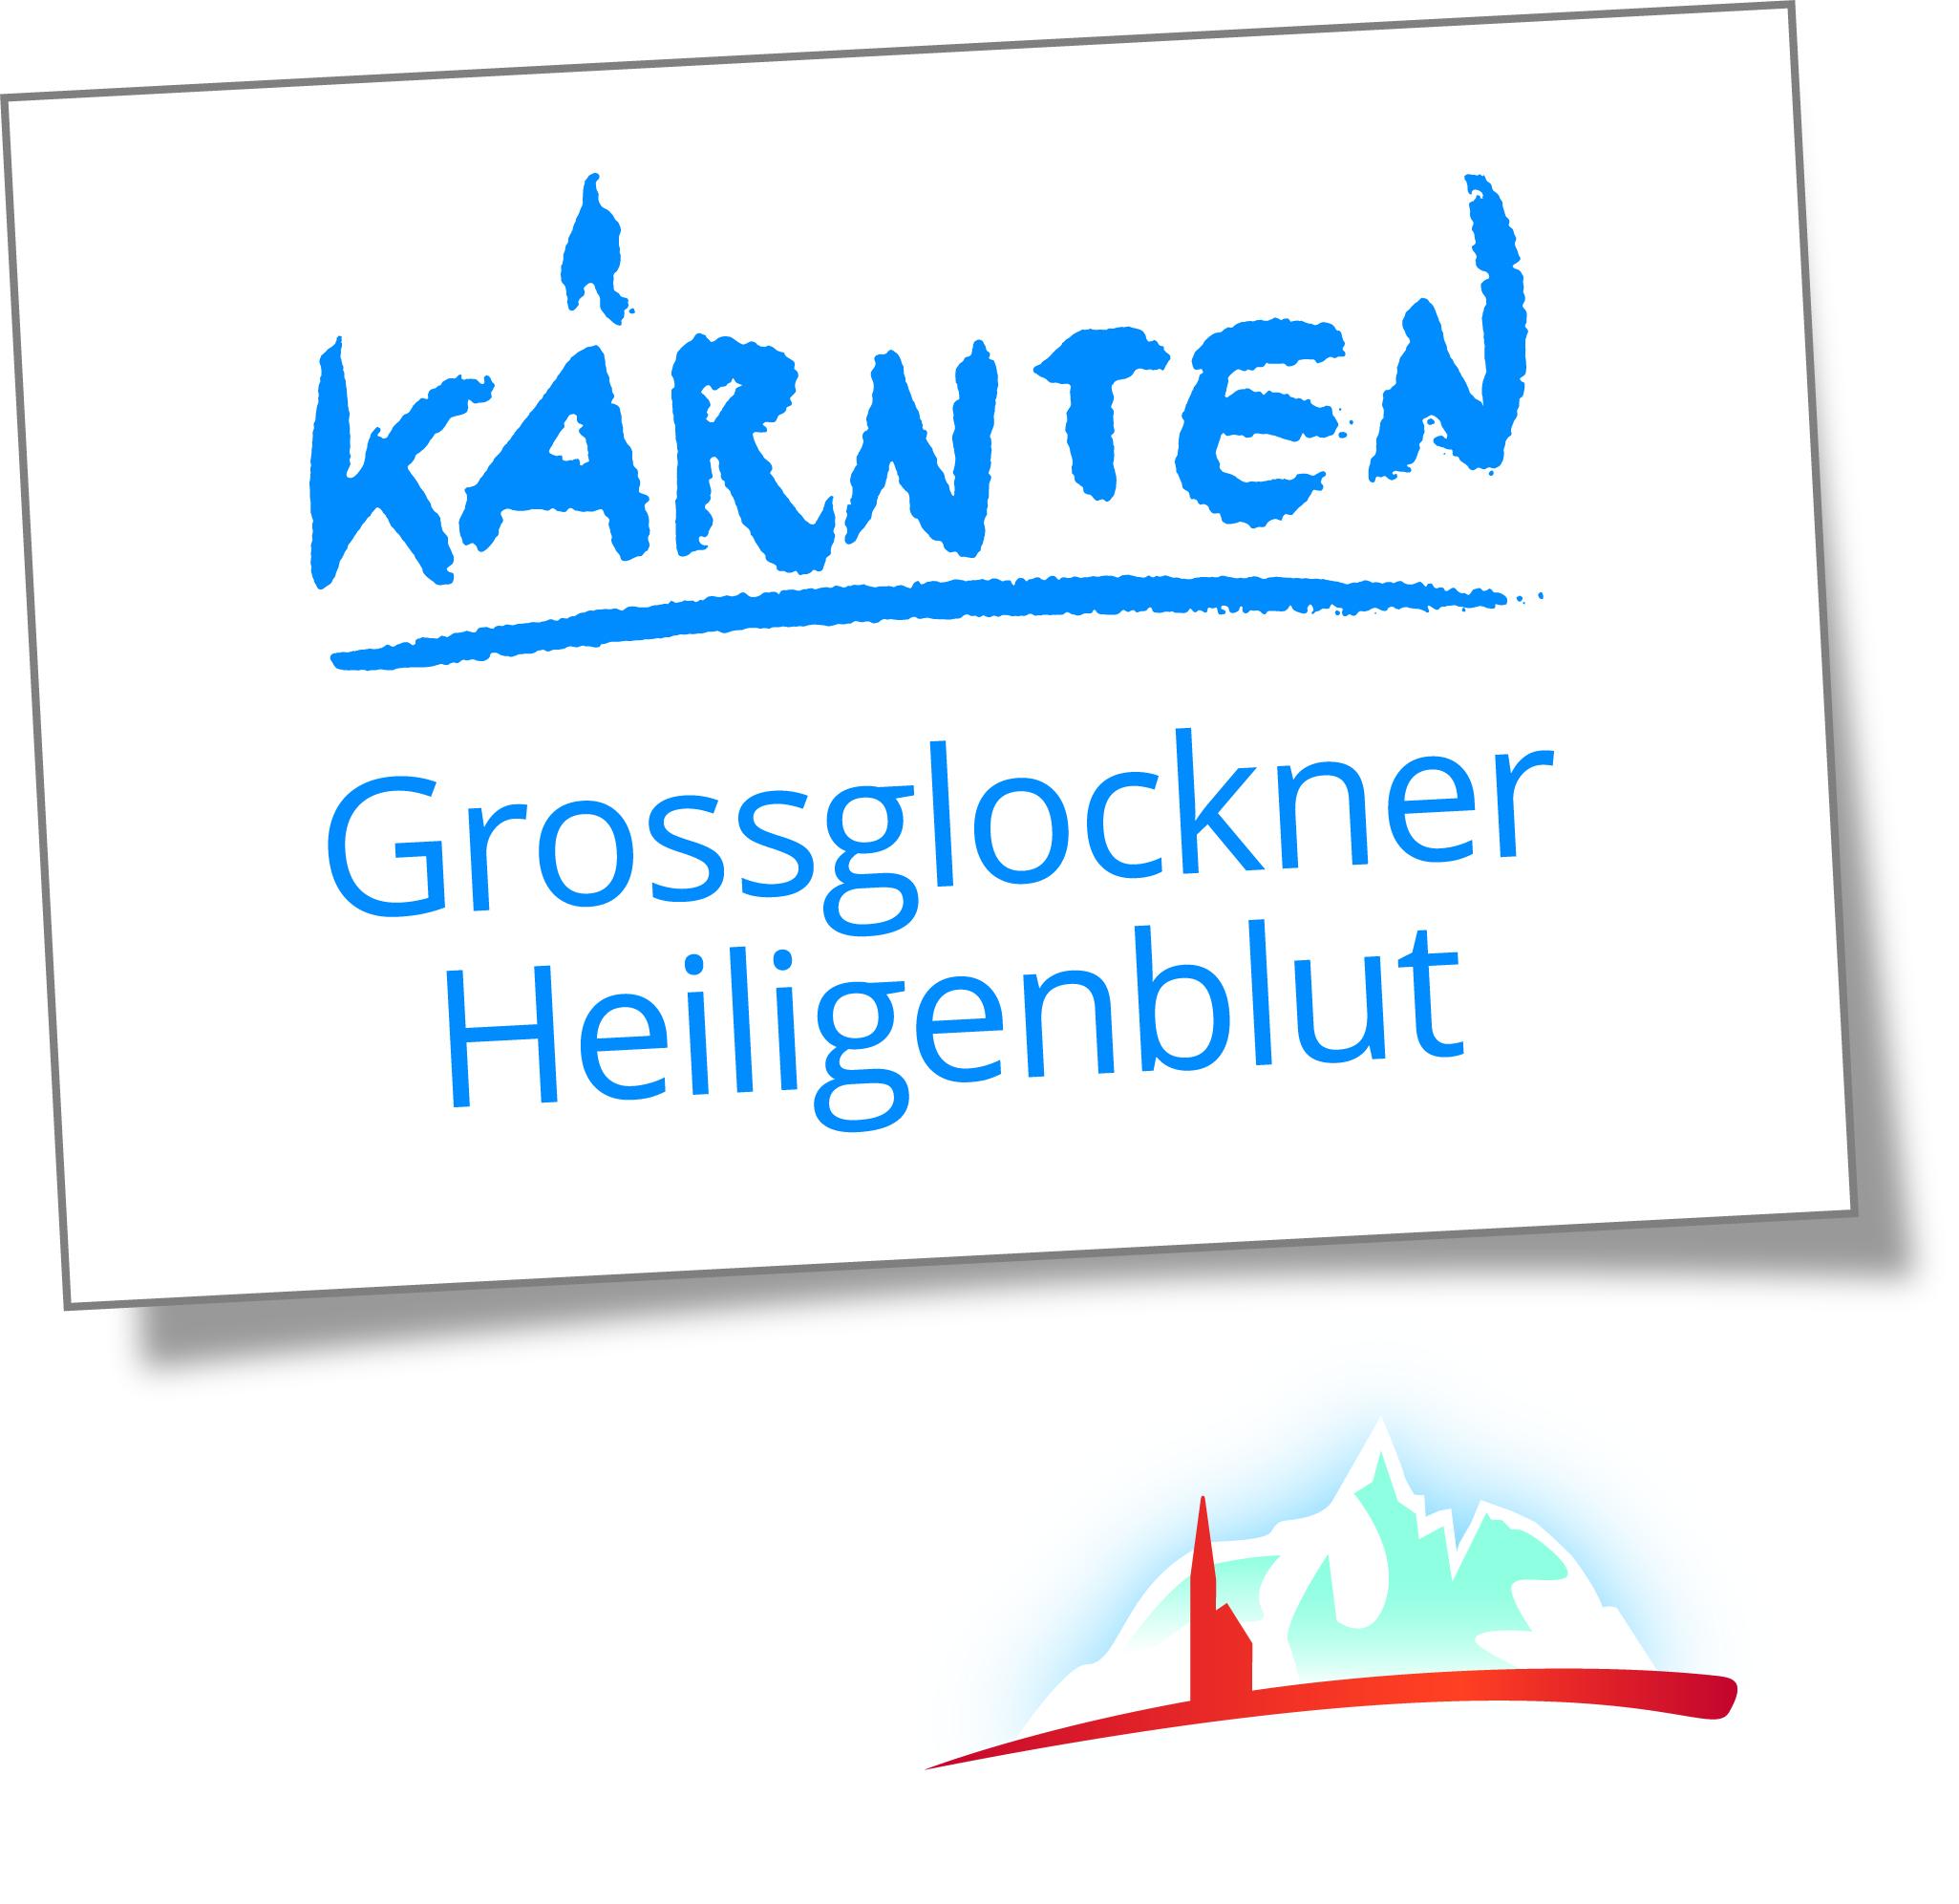 Grossglockner/Heiligenblut - Logo